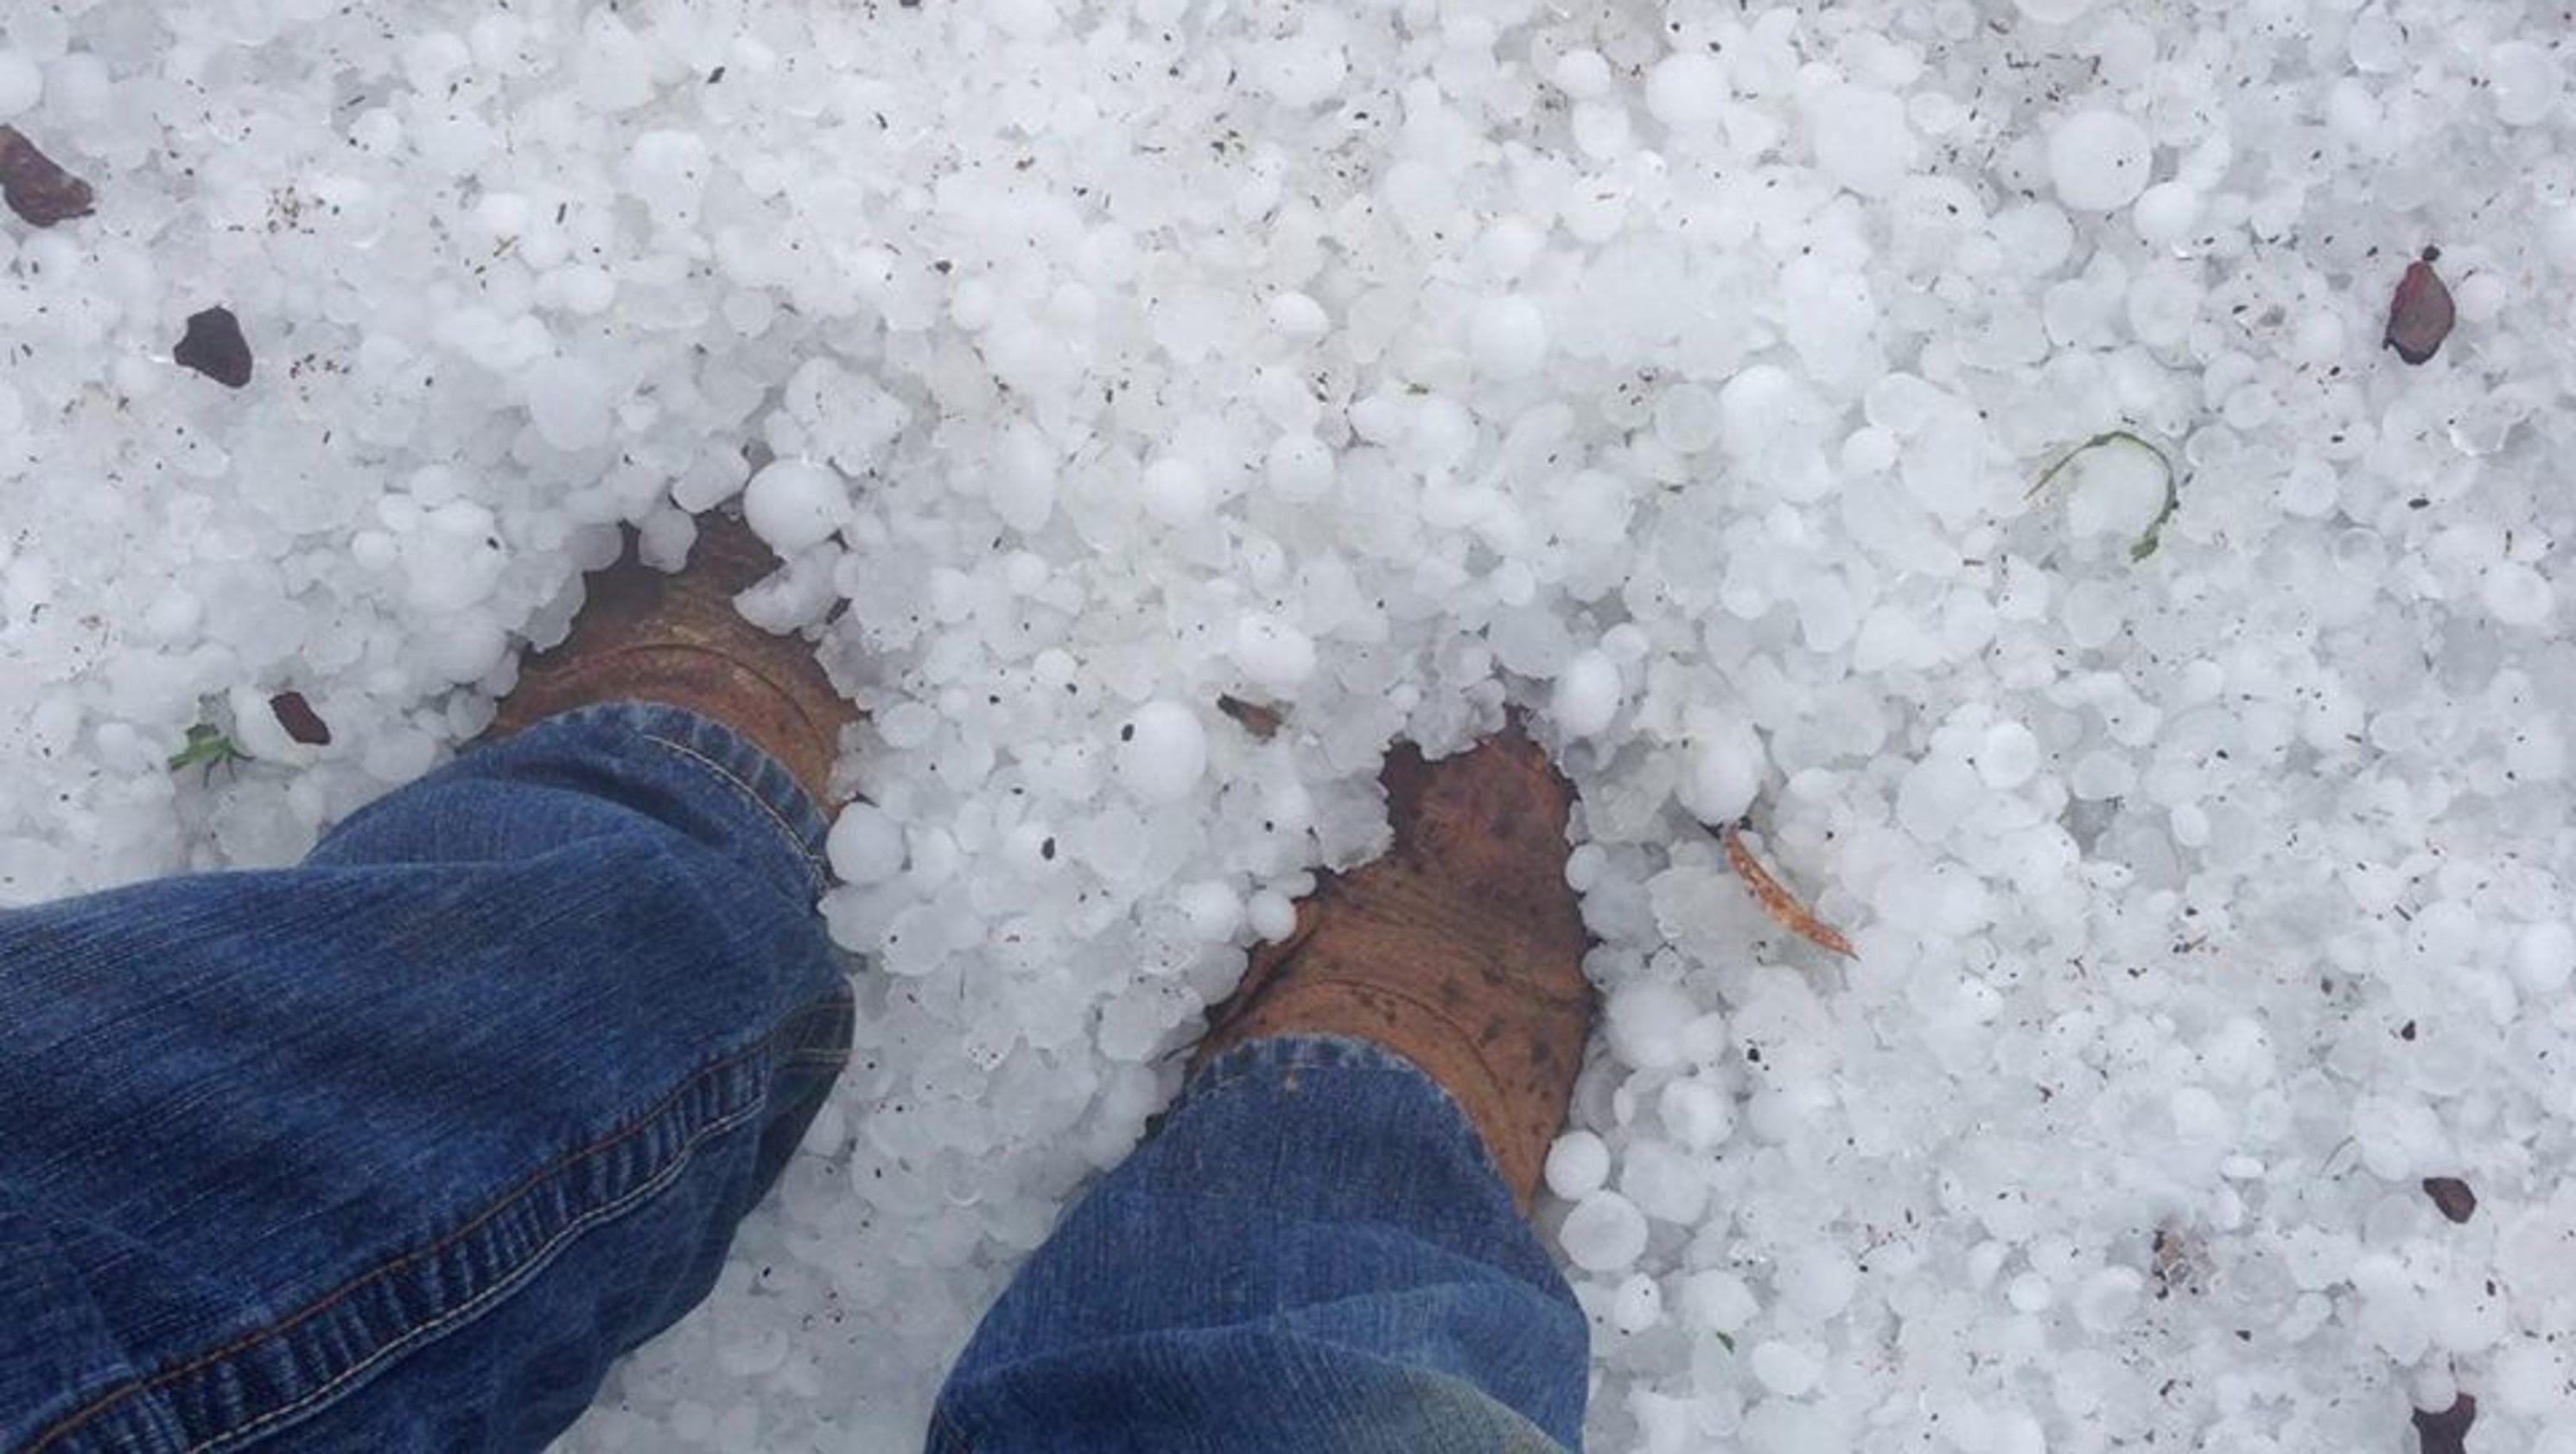 st  patrick u0026 39 s day hail storm